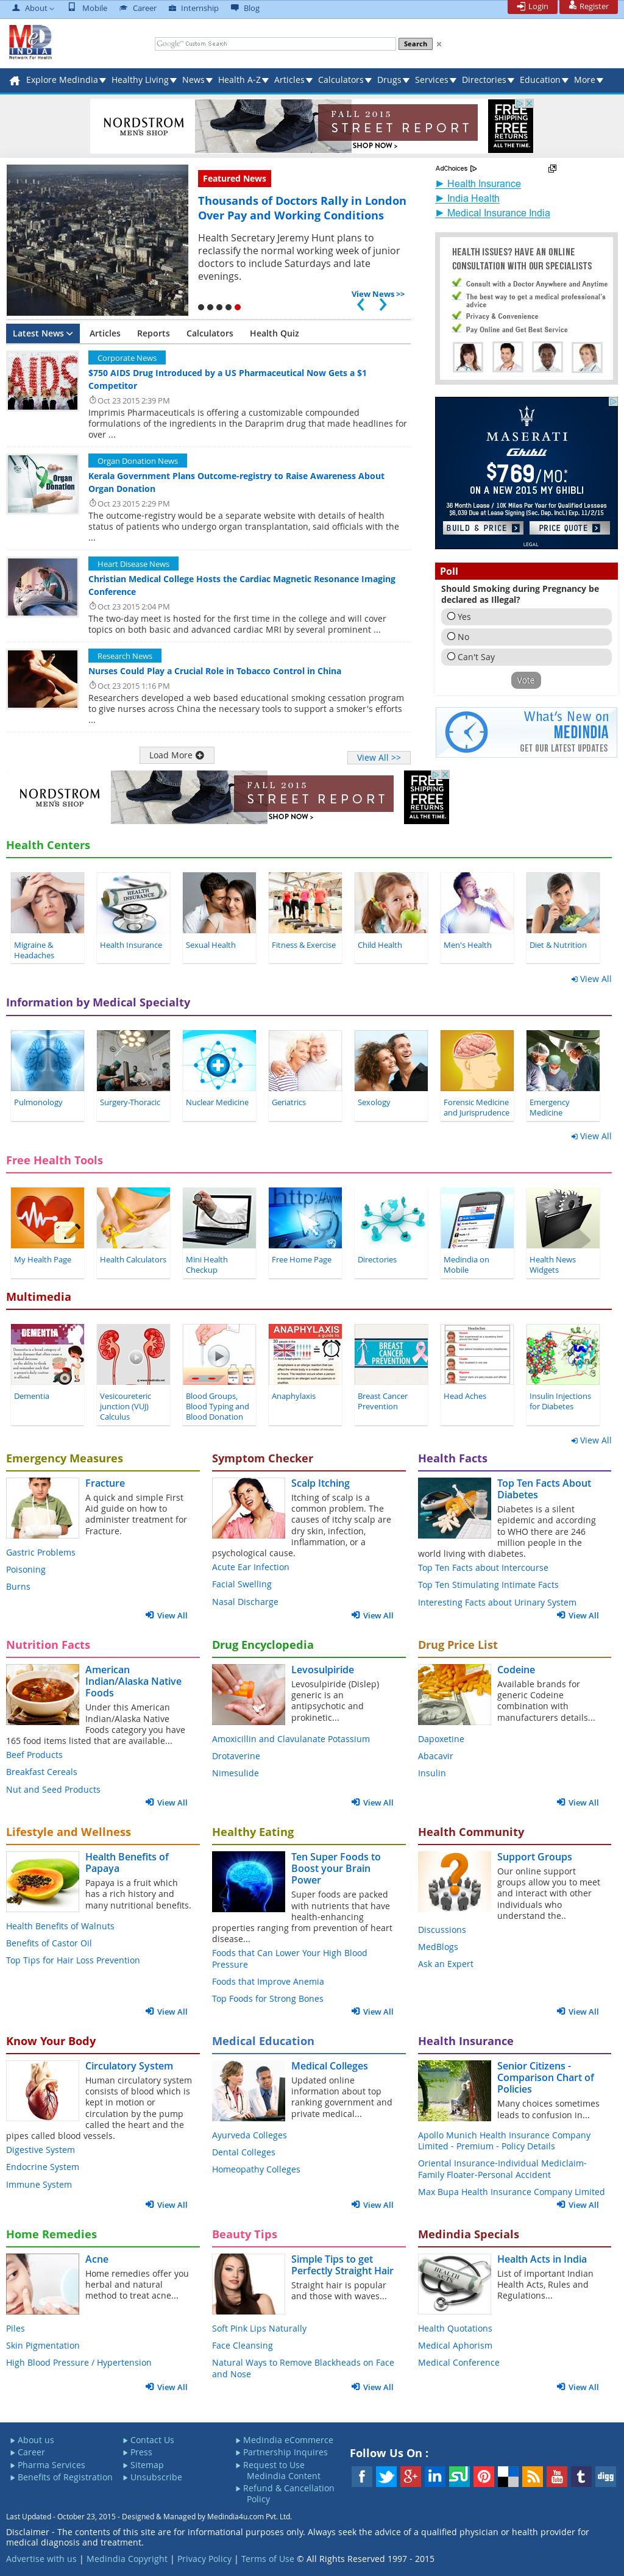 Medindia online dating